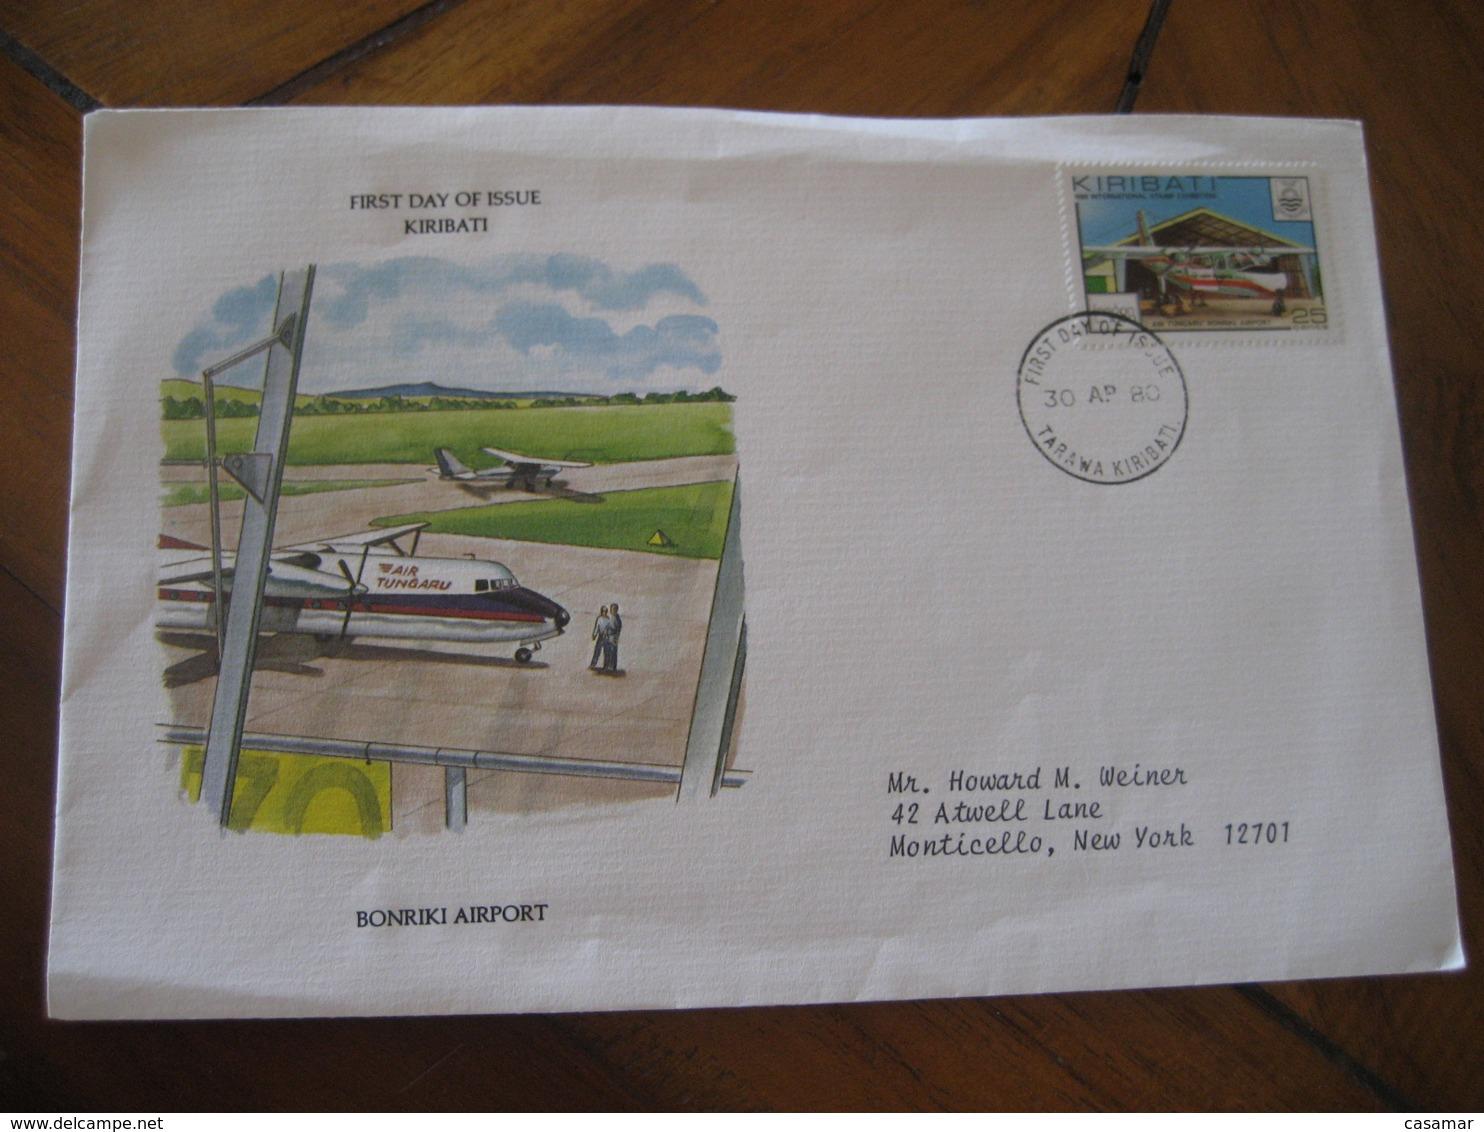 TARAWA Kiribati 1980 To Monticello USA Bonriki Airport Tungaru Airlines FDC Cancel Cover - Kiribati (1979-...)